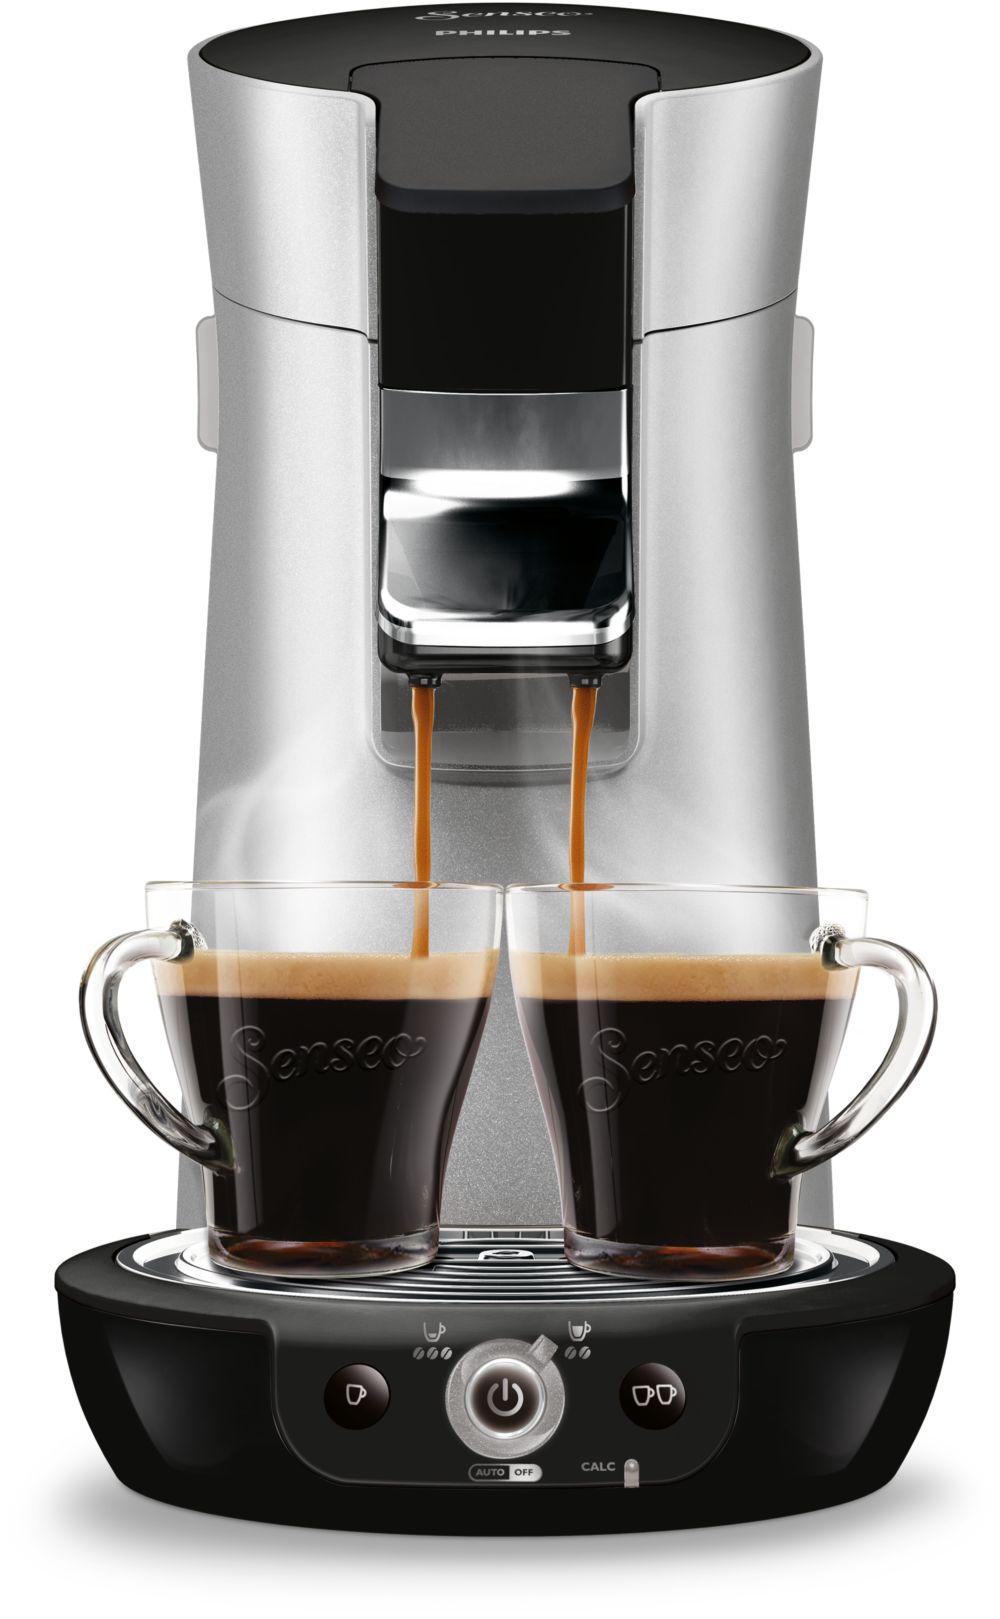 Senseo Viva Café Kaffeepadmaschine HD7831/10 für 109,99 Euro